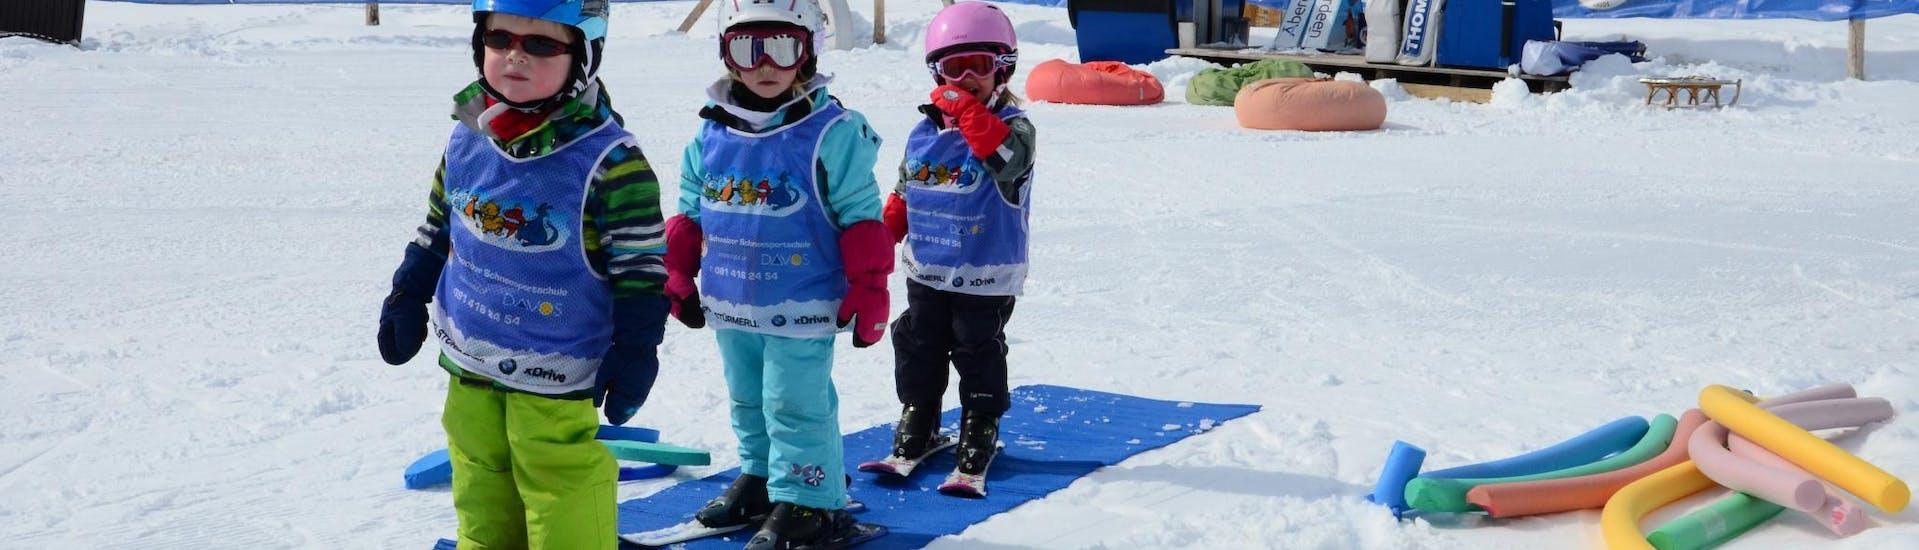 "Kids Ski Lessons ""Bolgen"" (8-12 y.) for Advanced Skiers"